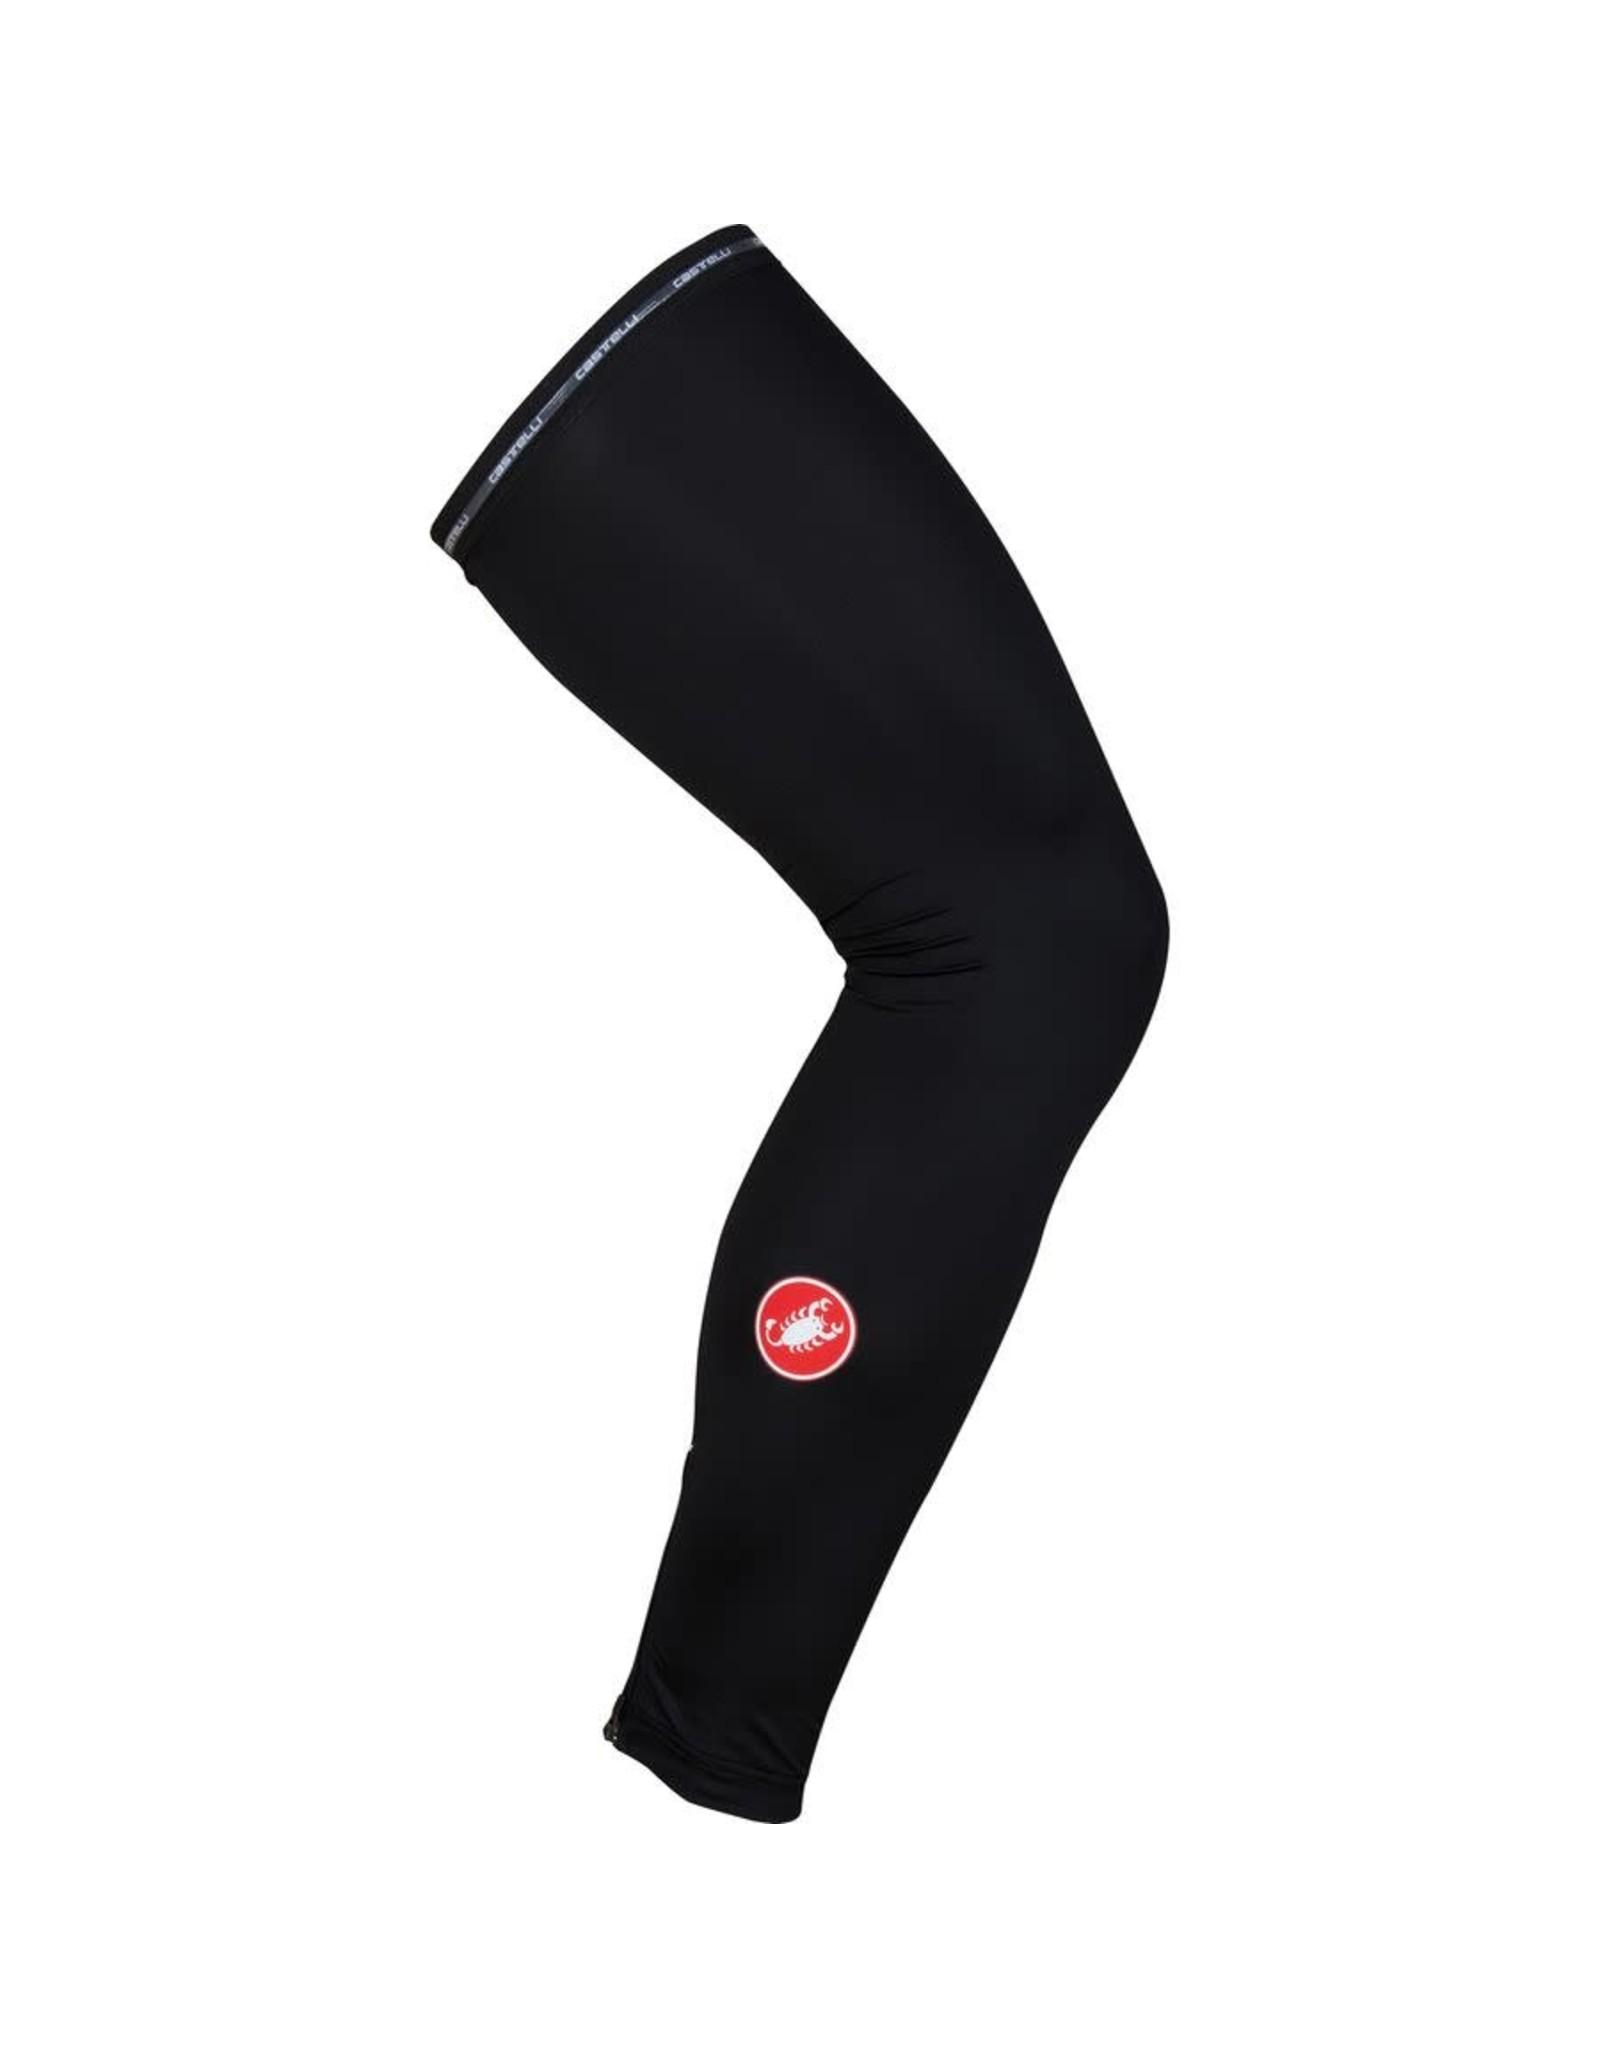 Castelli CASTELLI, UPF 50+, Leg Sleeve